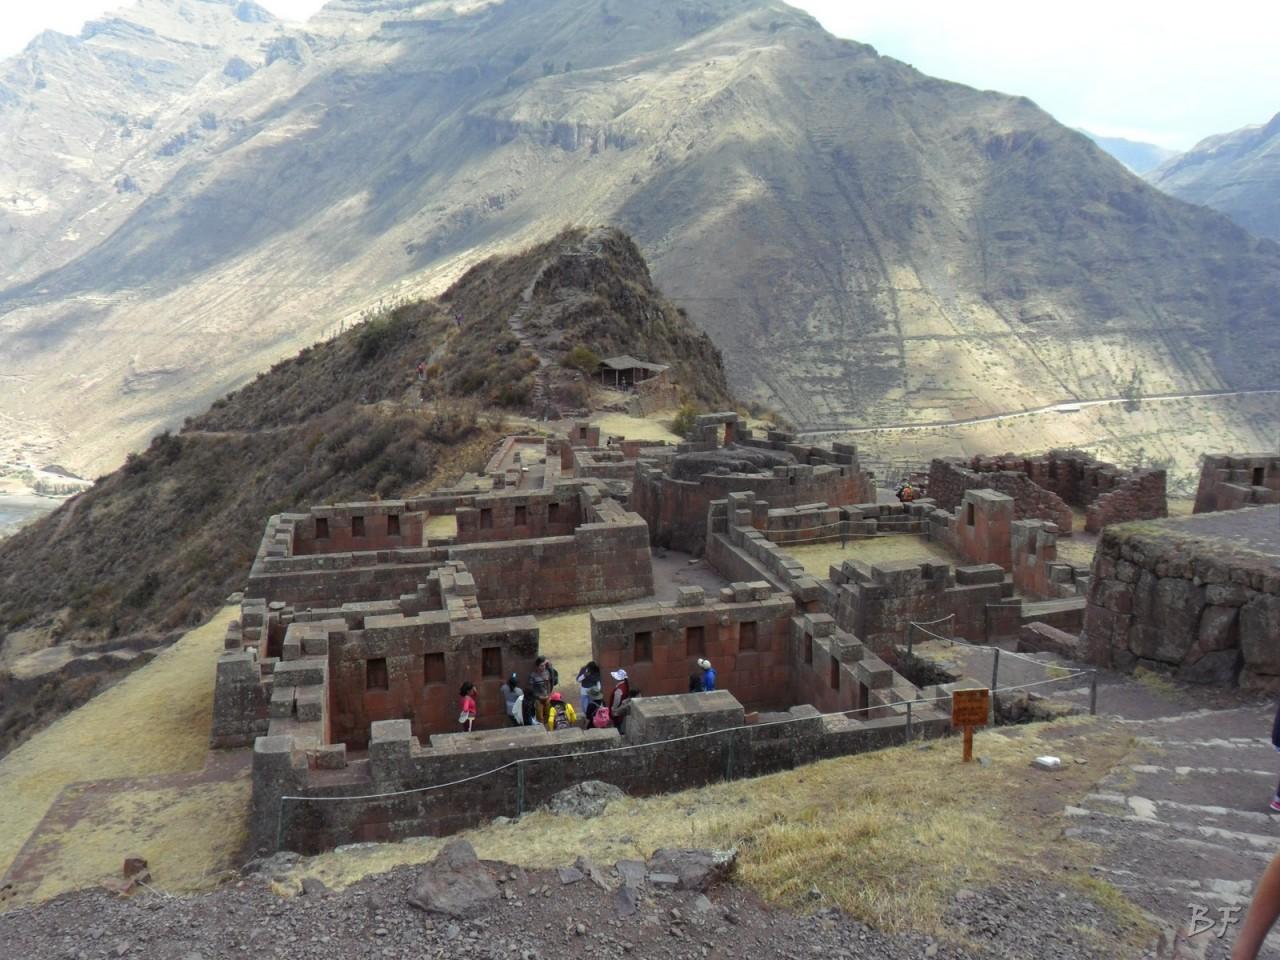 Mura-Poligonali-Megaliti-Altari-Rupestri-Pisac-Cusco-Perù-40